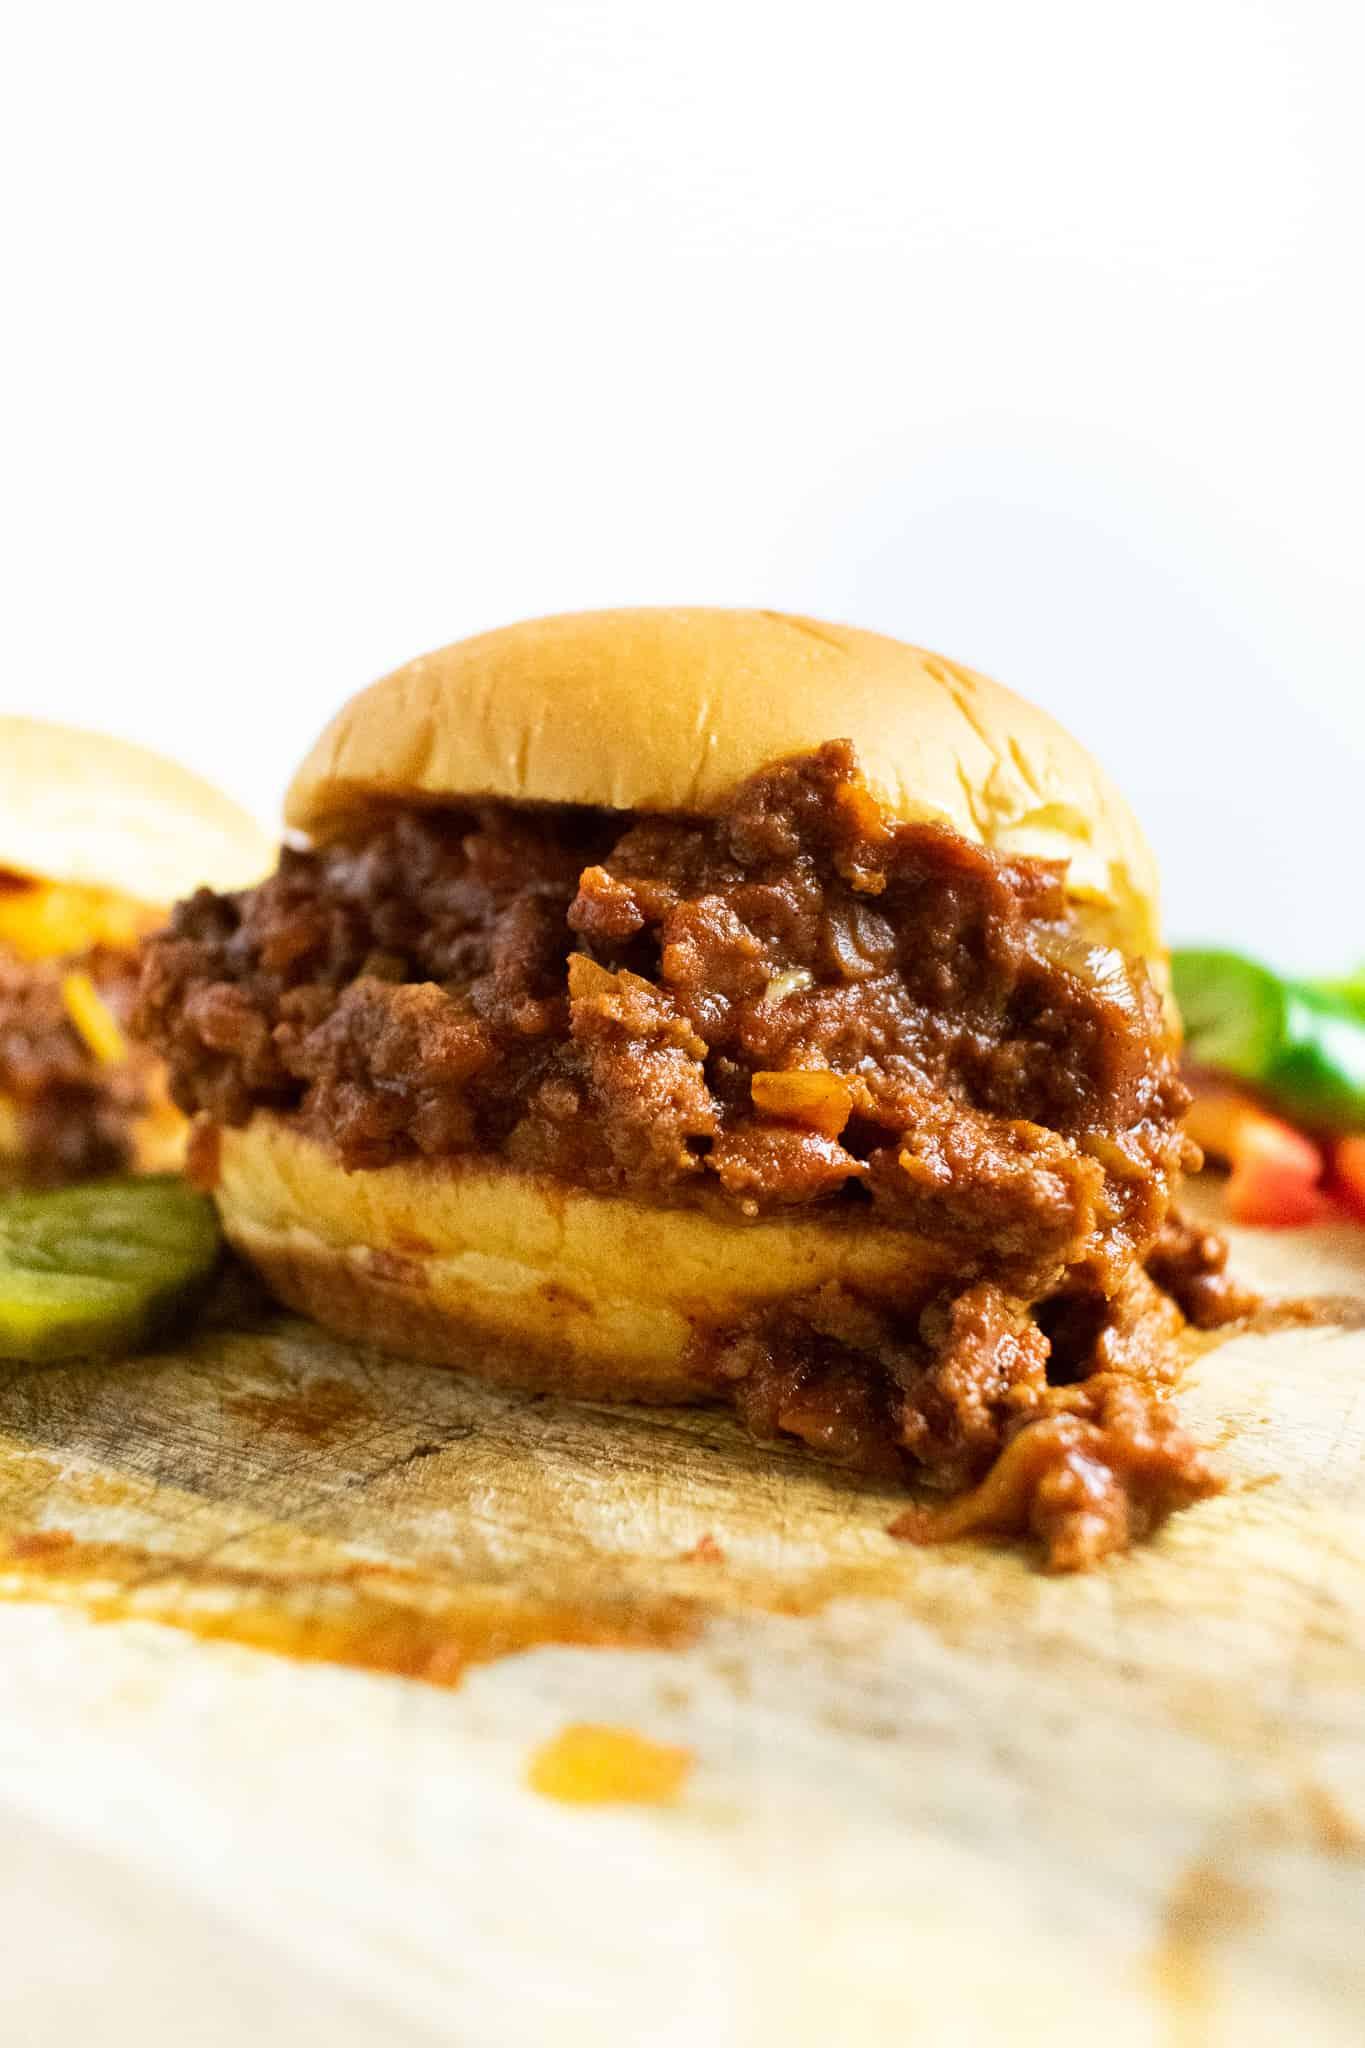 photo of a beef sandwich